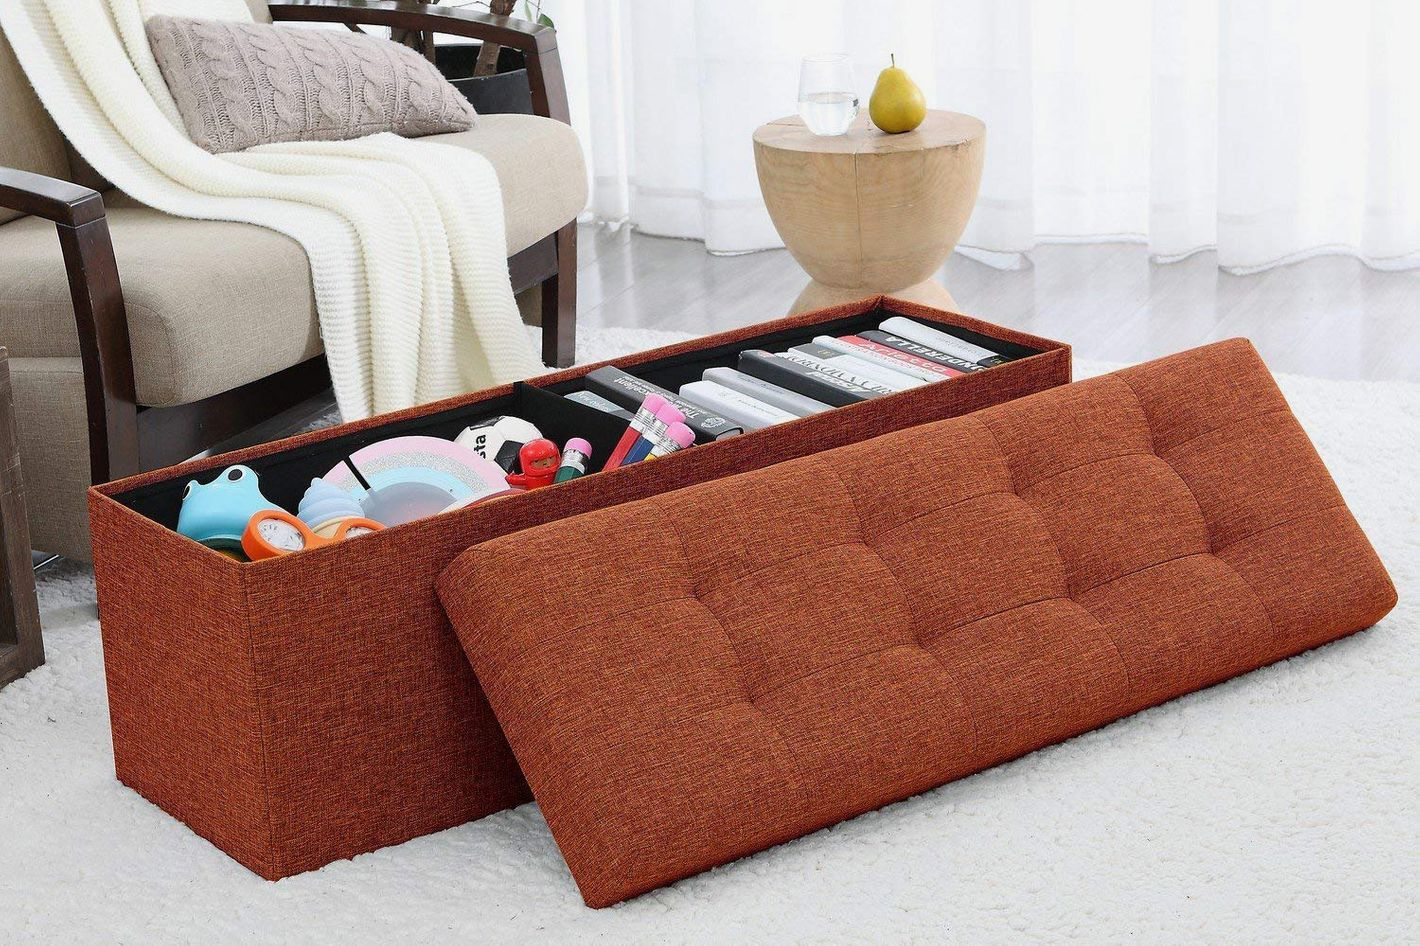 Ellington Home Foldable Tufted Linen Large Storage Ottoman Bench